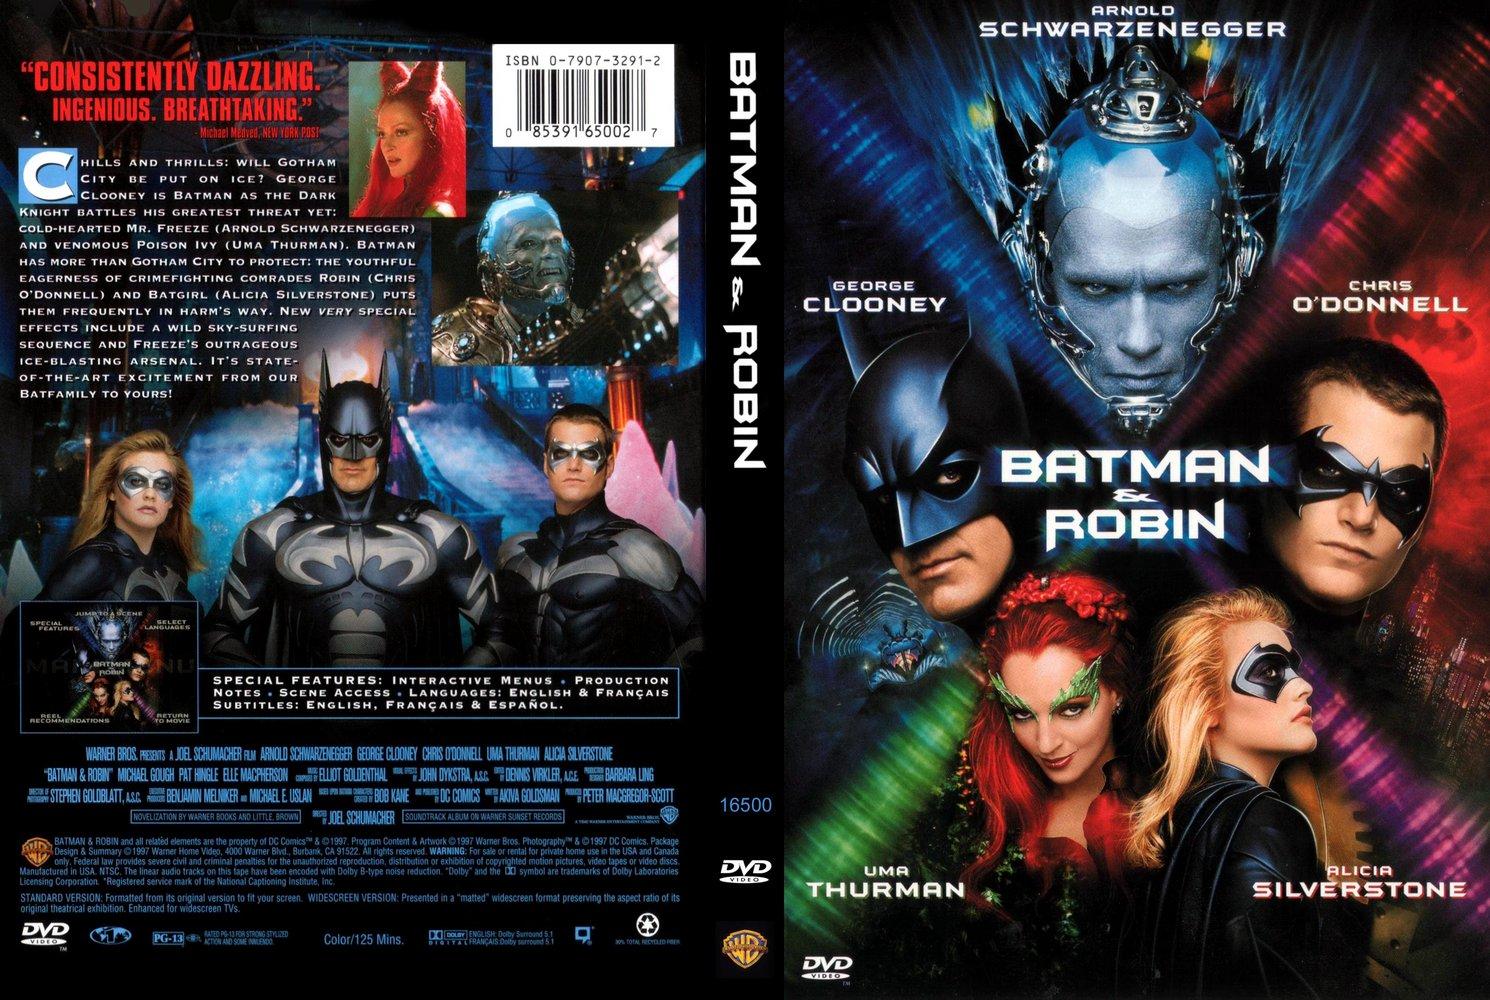 http://1.bp.blogspot.com/-GDLQtsbQ1MM/UGCQUH-5myI/AAAAAAAAAD4/BS_8YWtMiEM/s1600/Batman_And_Robin-%255Bcdcovers_cc%255D-front.jpg